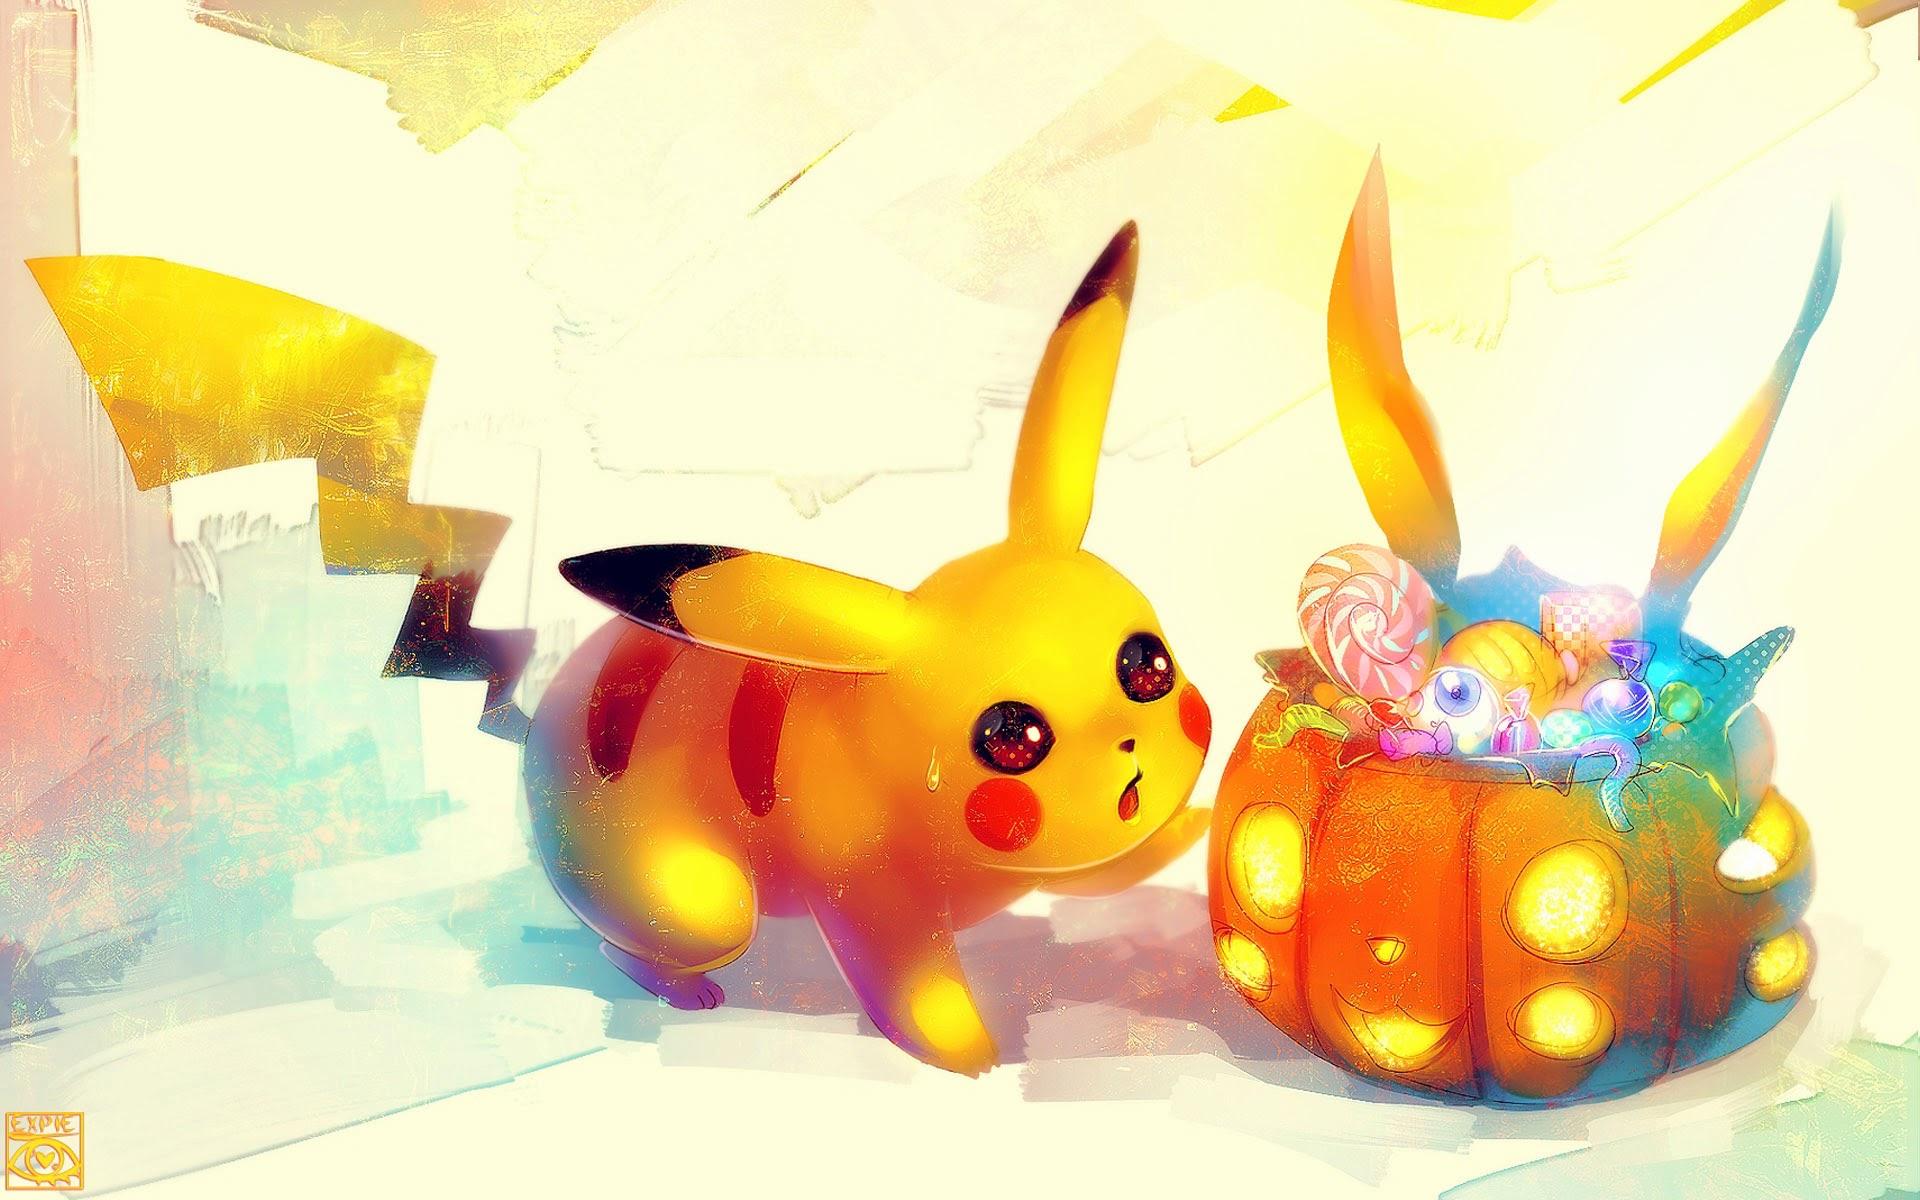 [75+] Cute Pikachu Wallpaper on WallpaperSafari